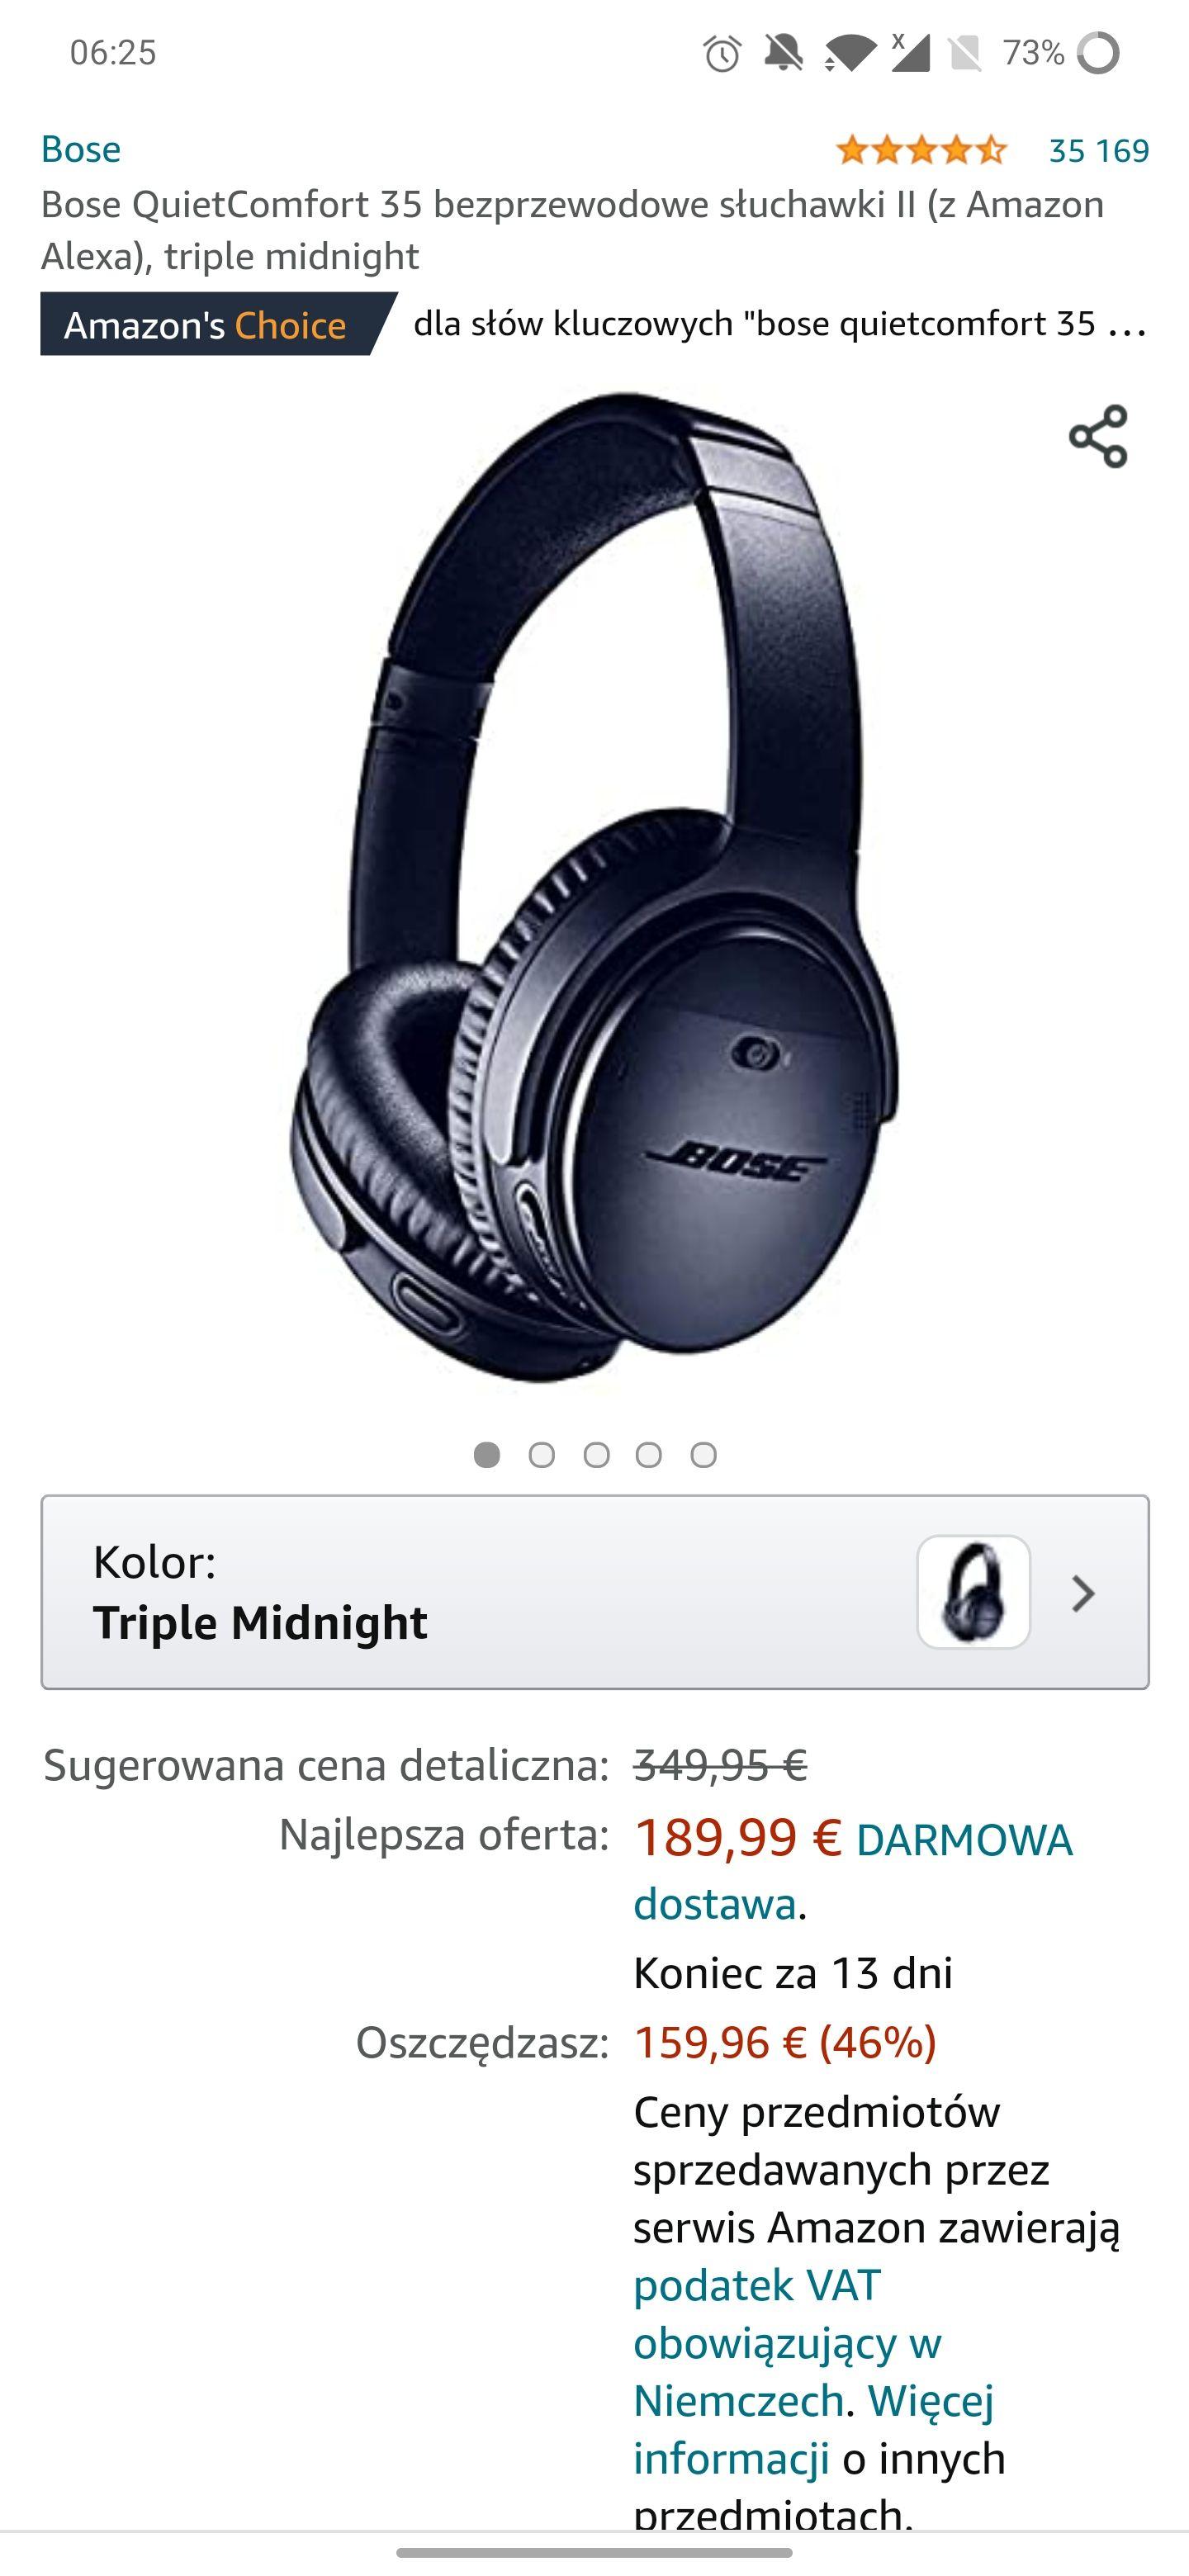 Słuchawki Bose QuietComfort 35 201.45 euro